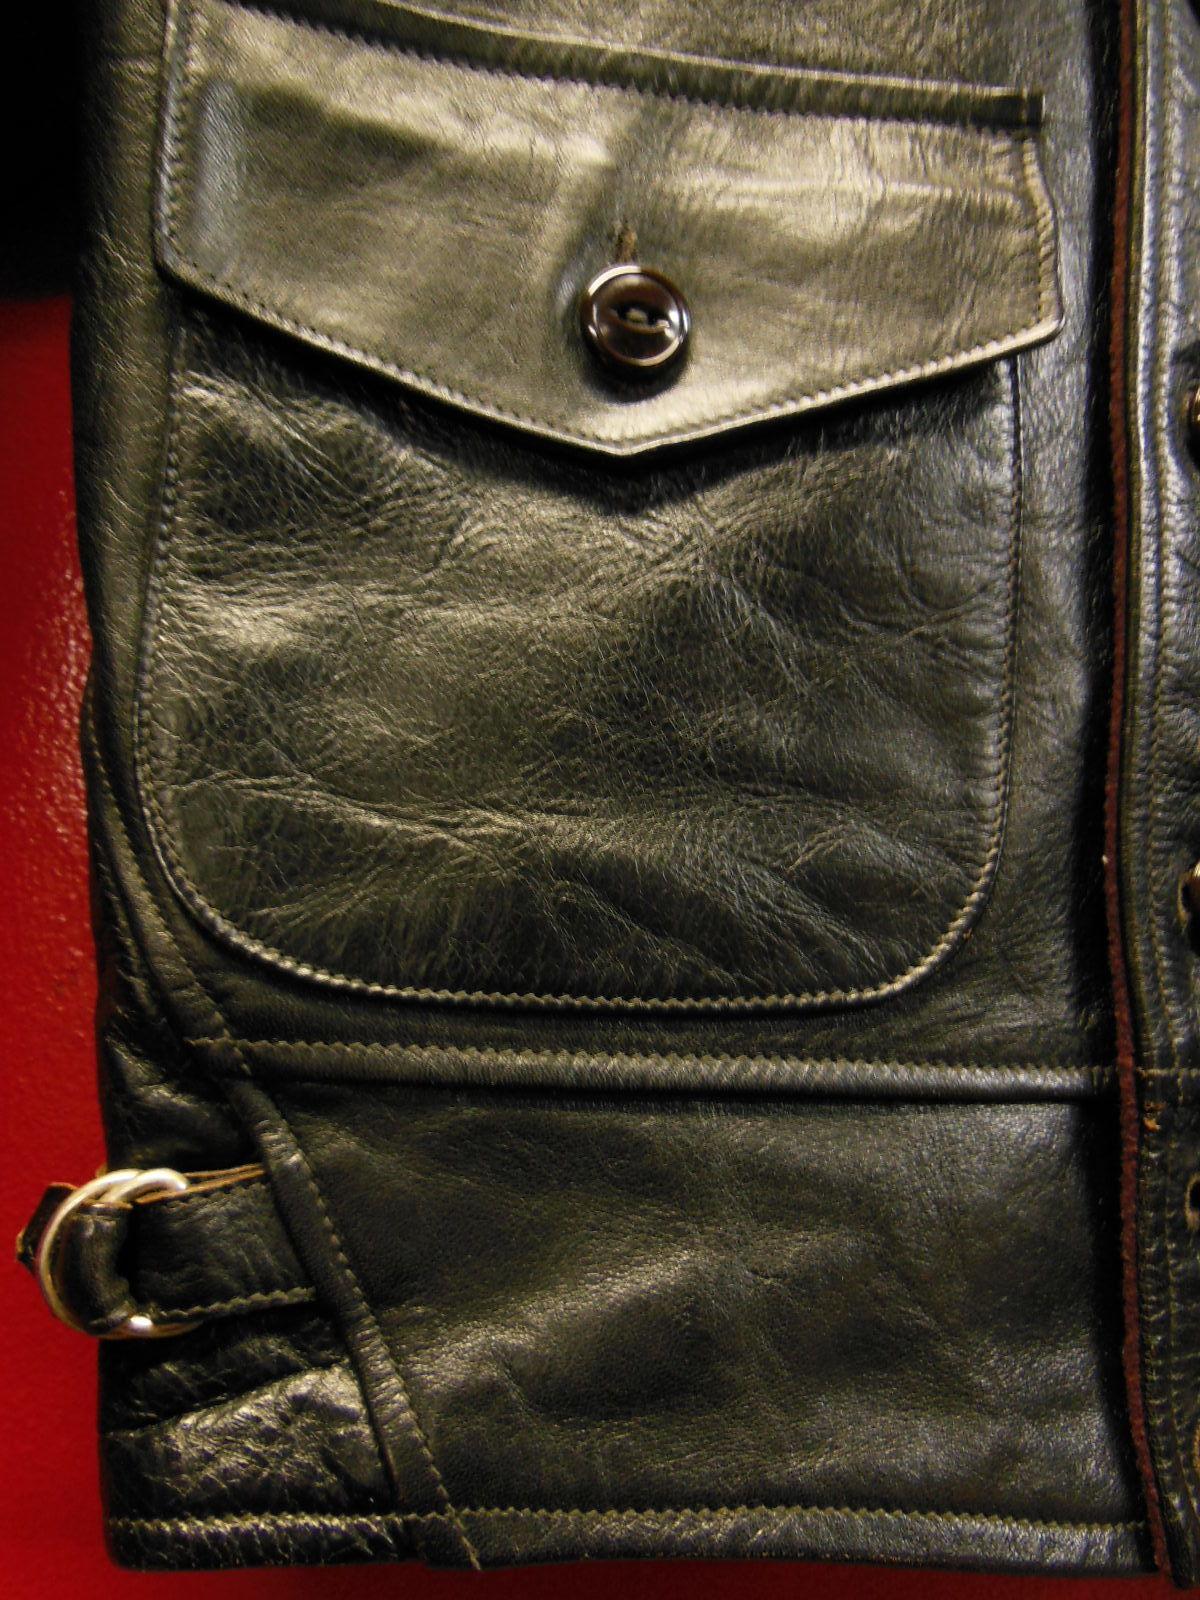 USED HIMEL BROTHERS LEATHER HERON 1929/新喜皮革製黒ホースハイド/SIZE-36/ボタンフロント A-1 ジャケット_c0187684_15034120.jpg